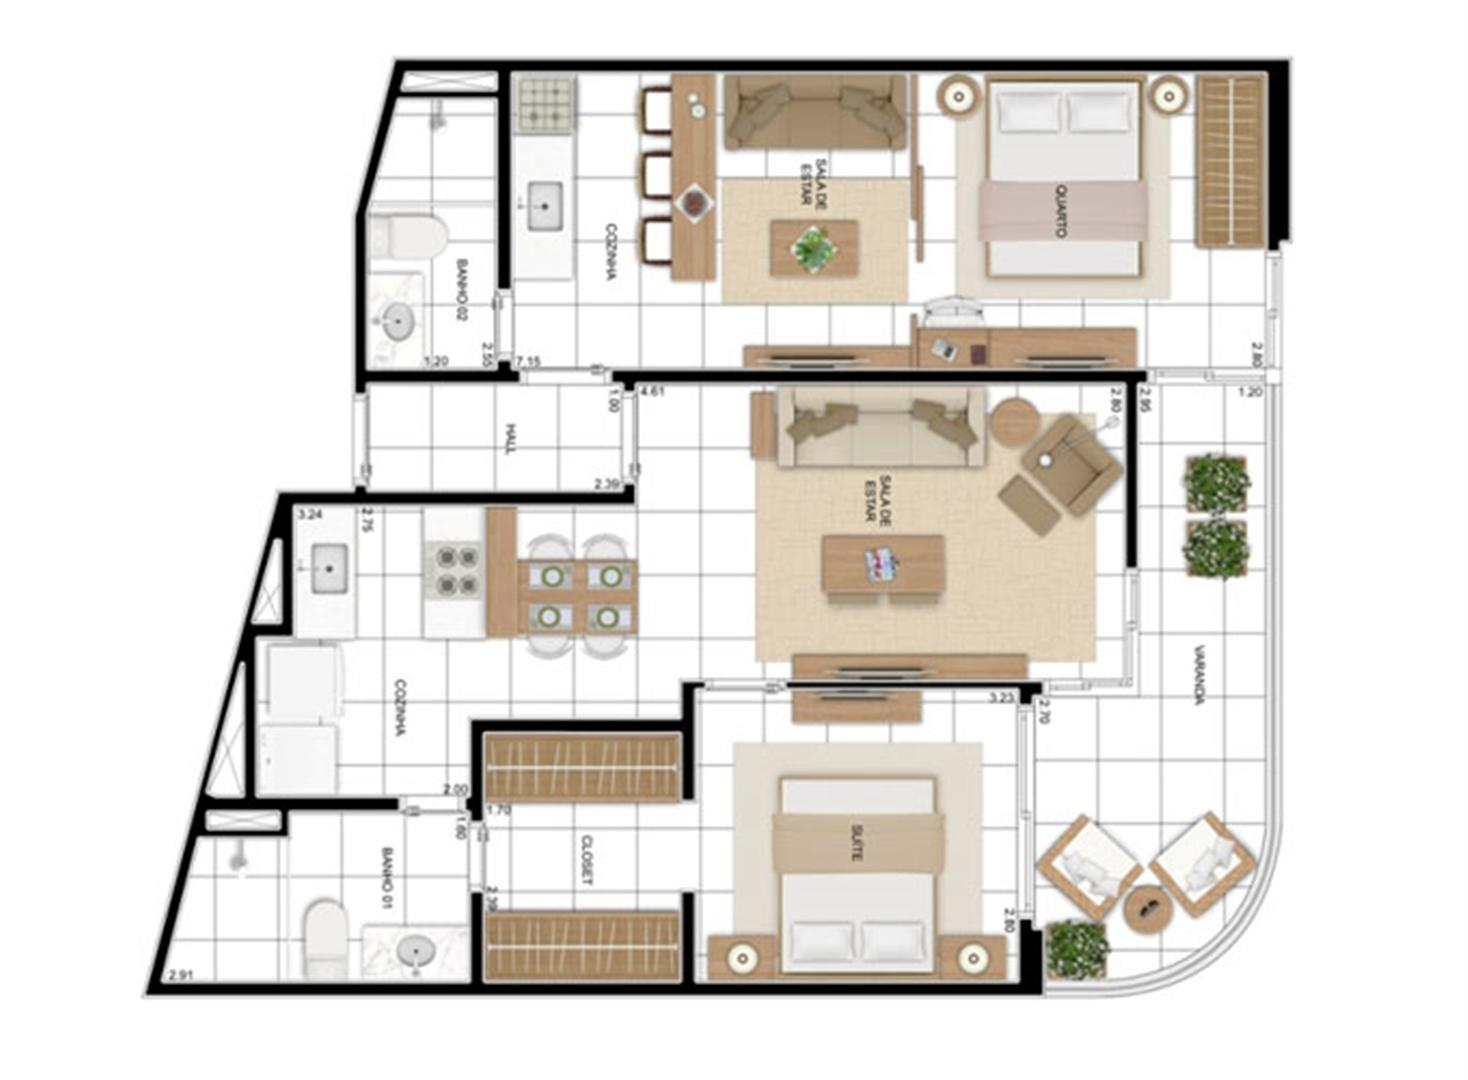 PLANTA - APTO TIPO A - DOUBLE FLAT OPÇÃO 03  | In Mare Bali – Apartamento no  Distrito Litoral de Cotovelo - Parnamirim - Rio Grande do Norte